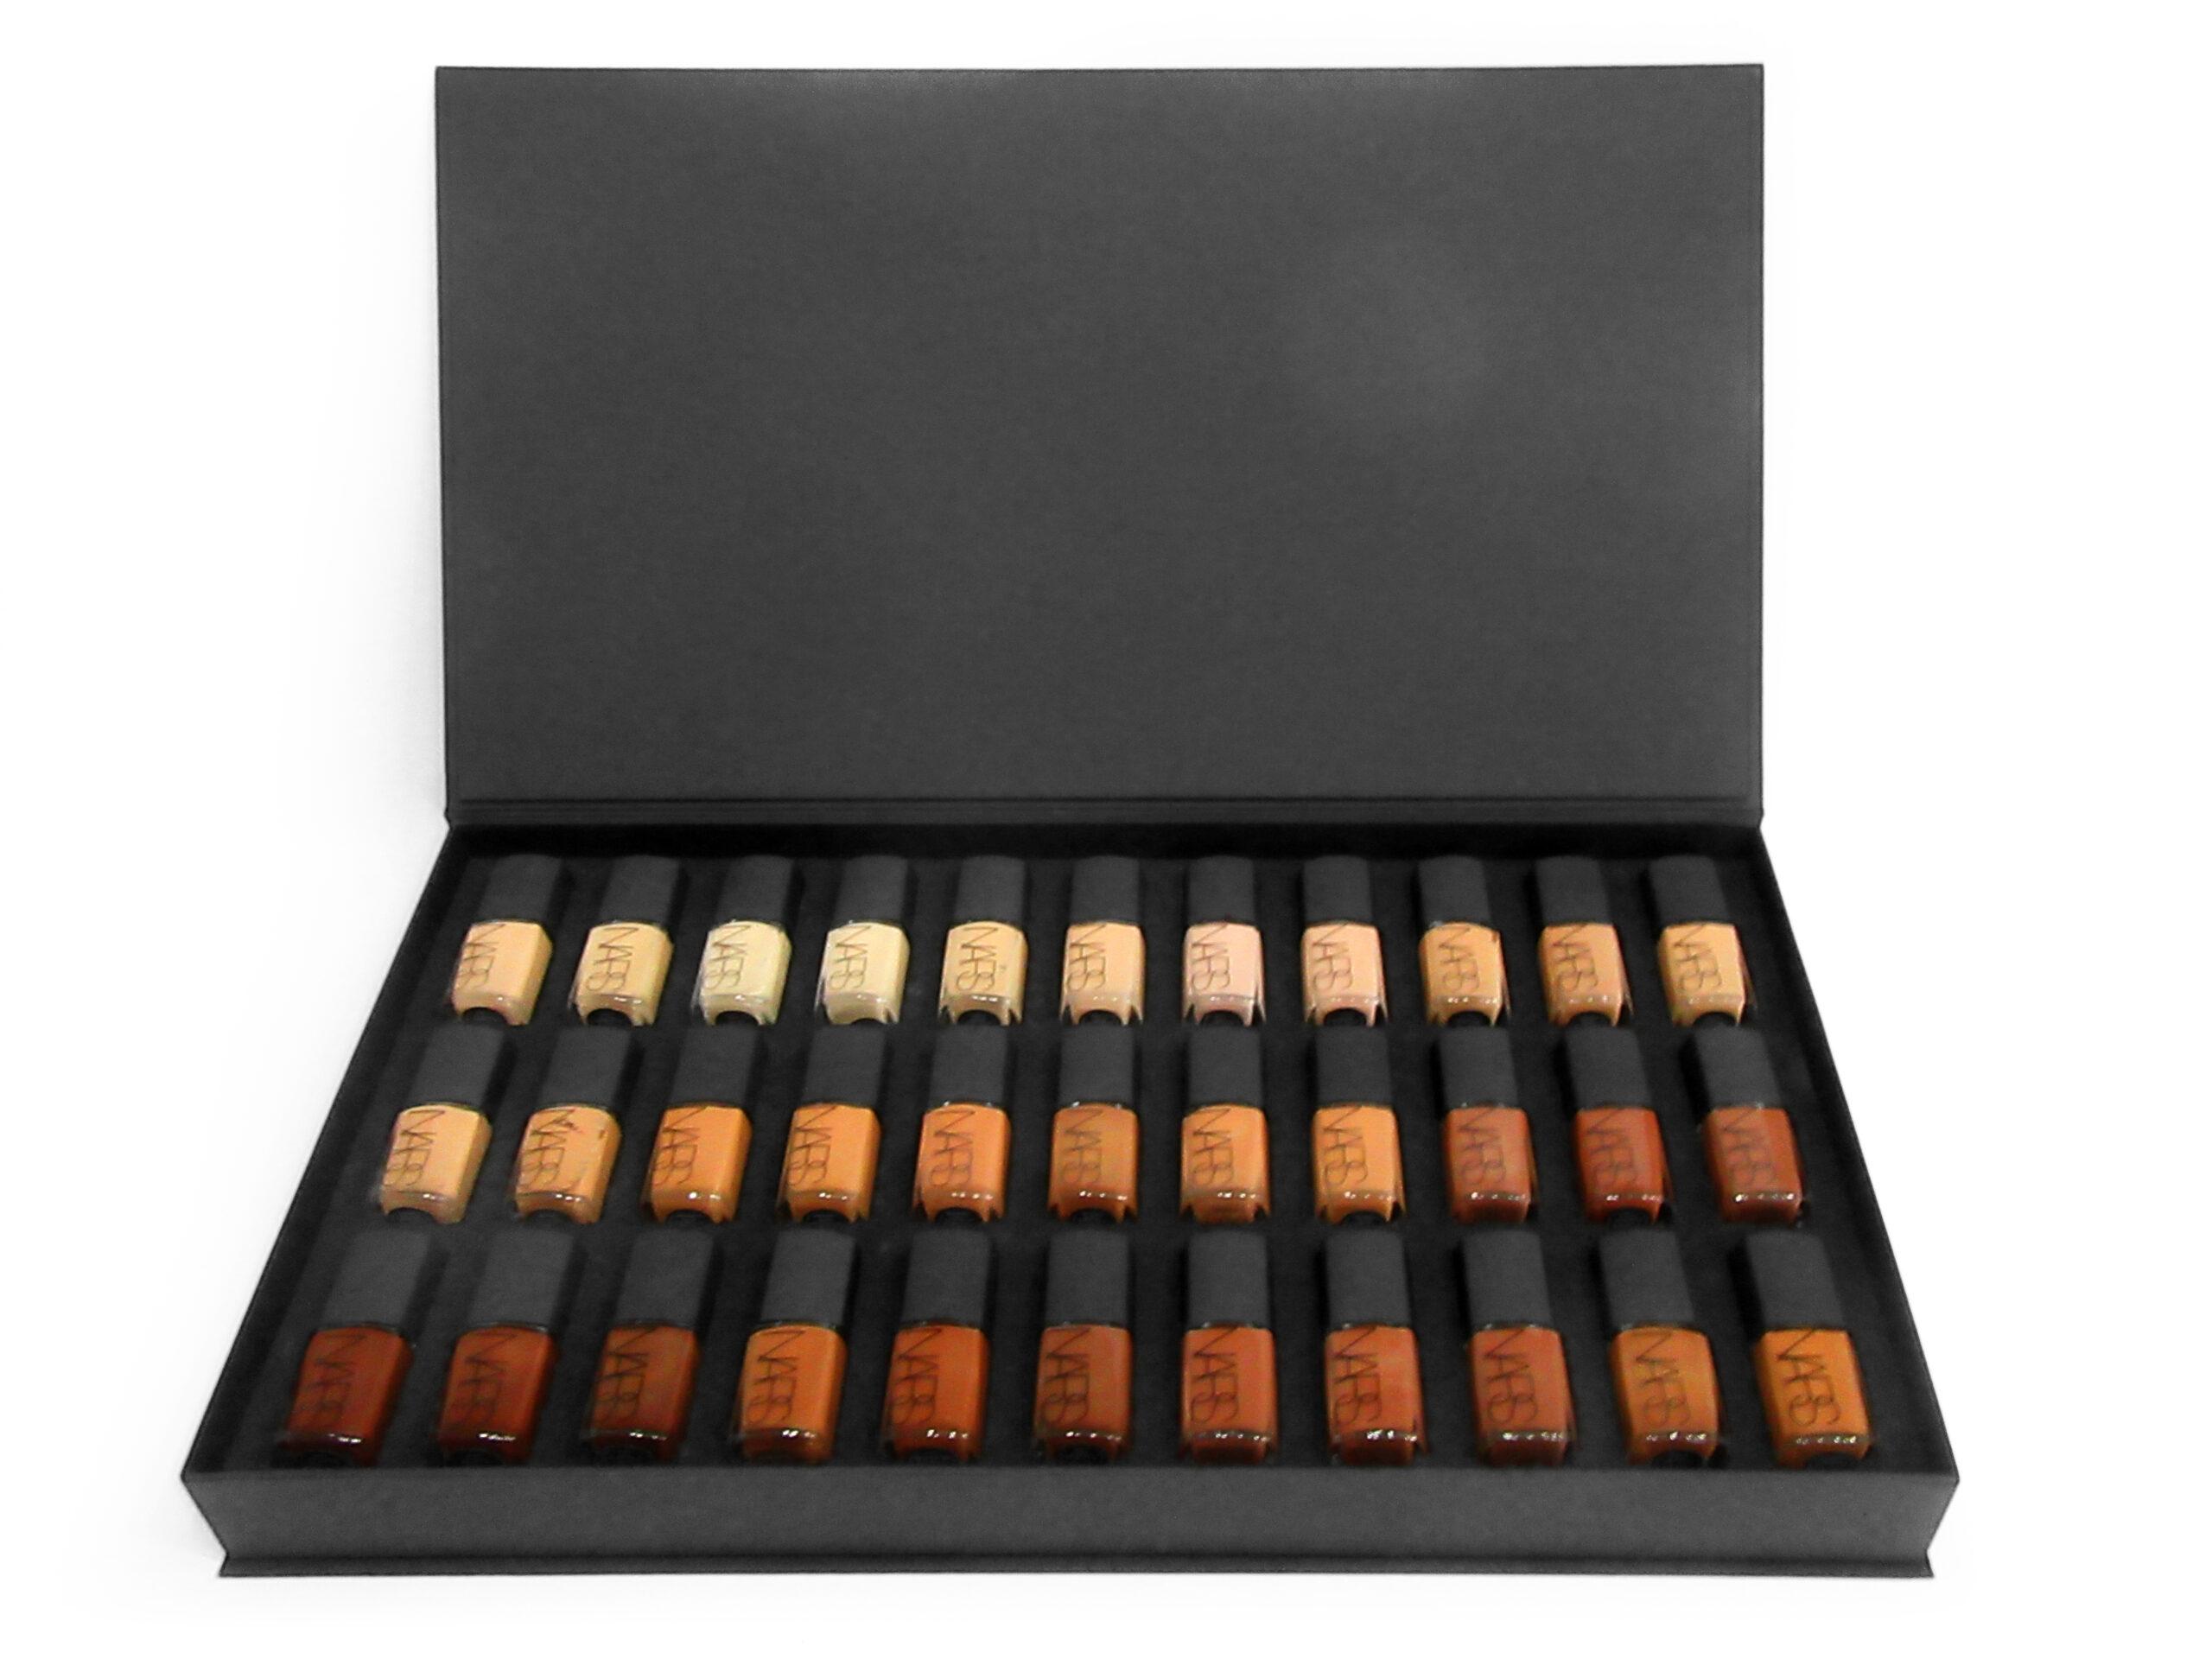 NARS Cosmetics - Custom Packaging Design